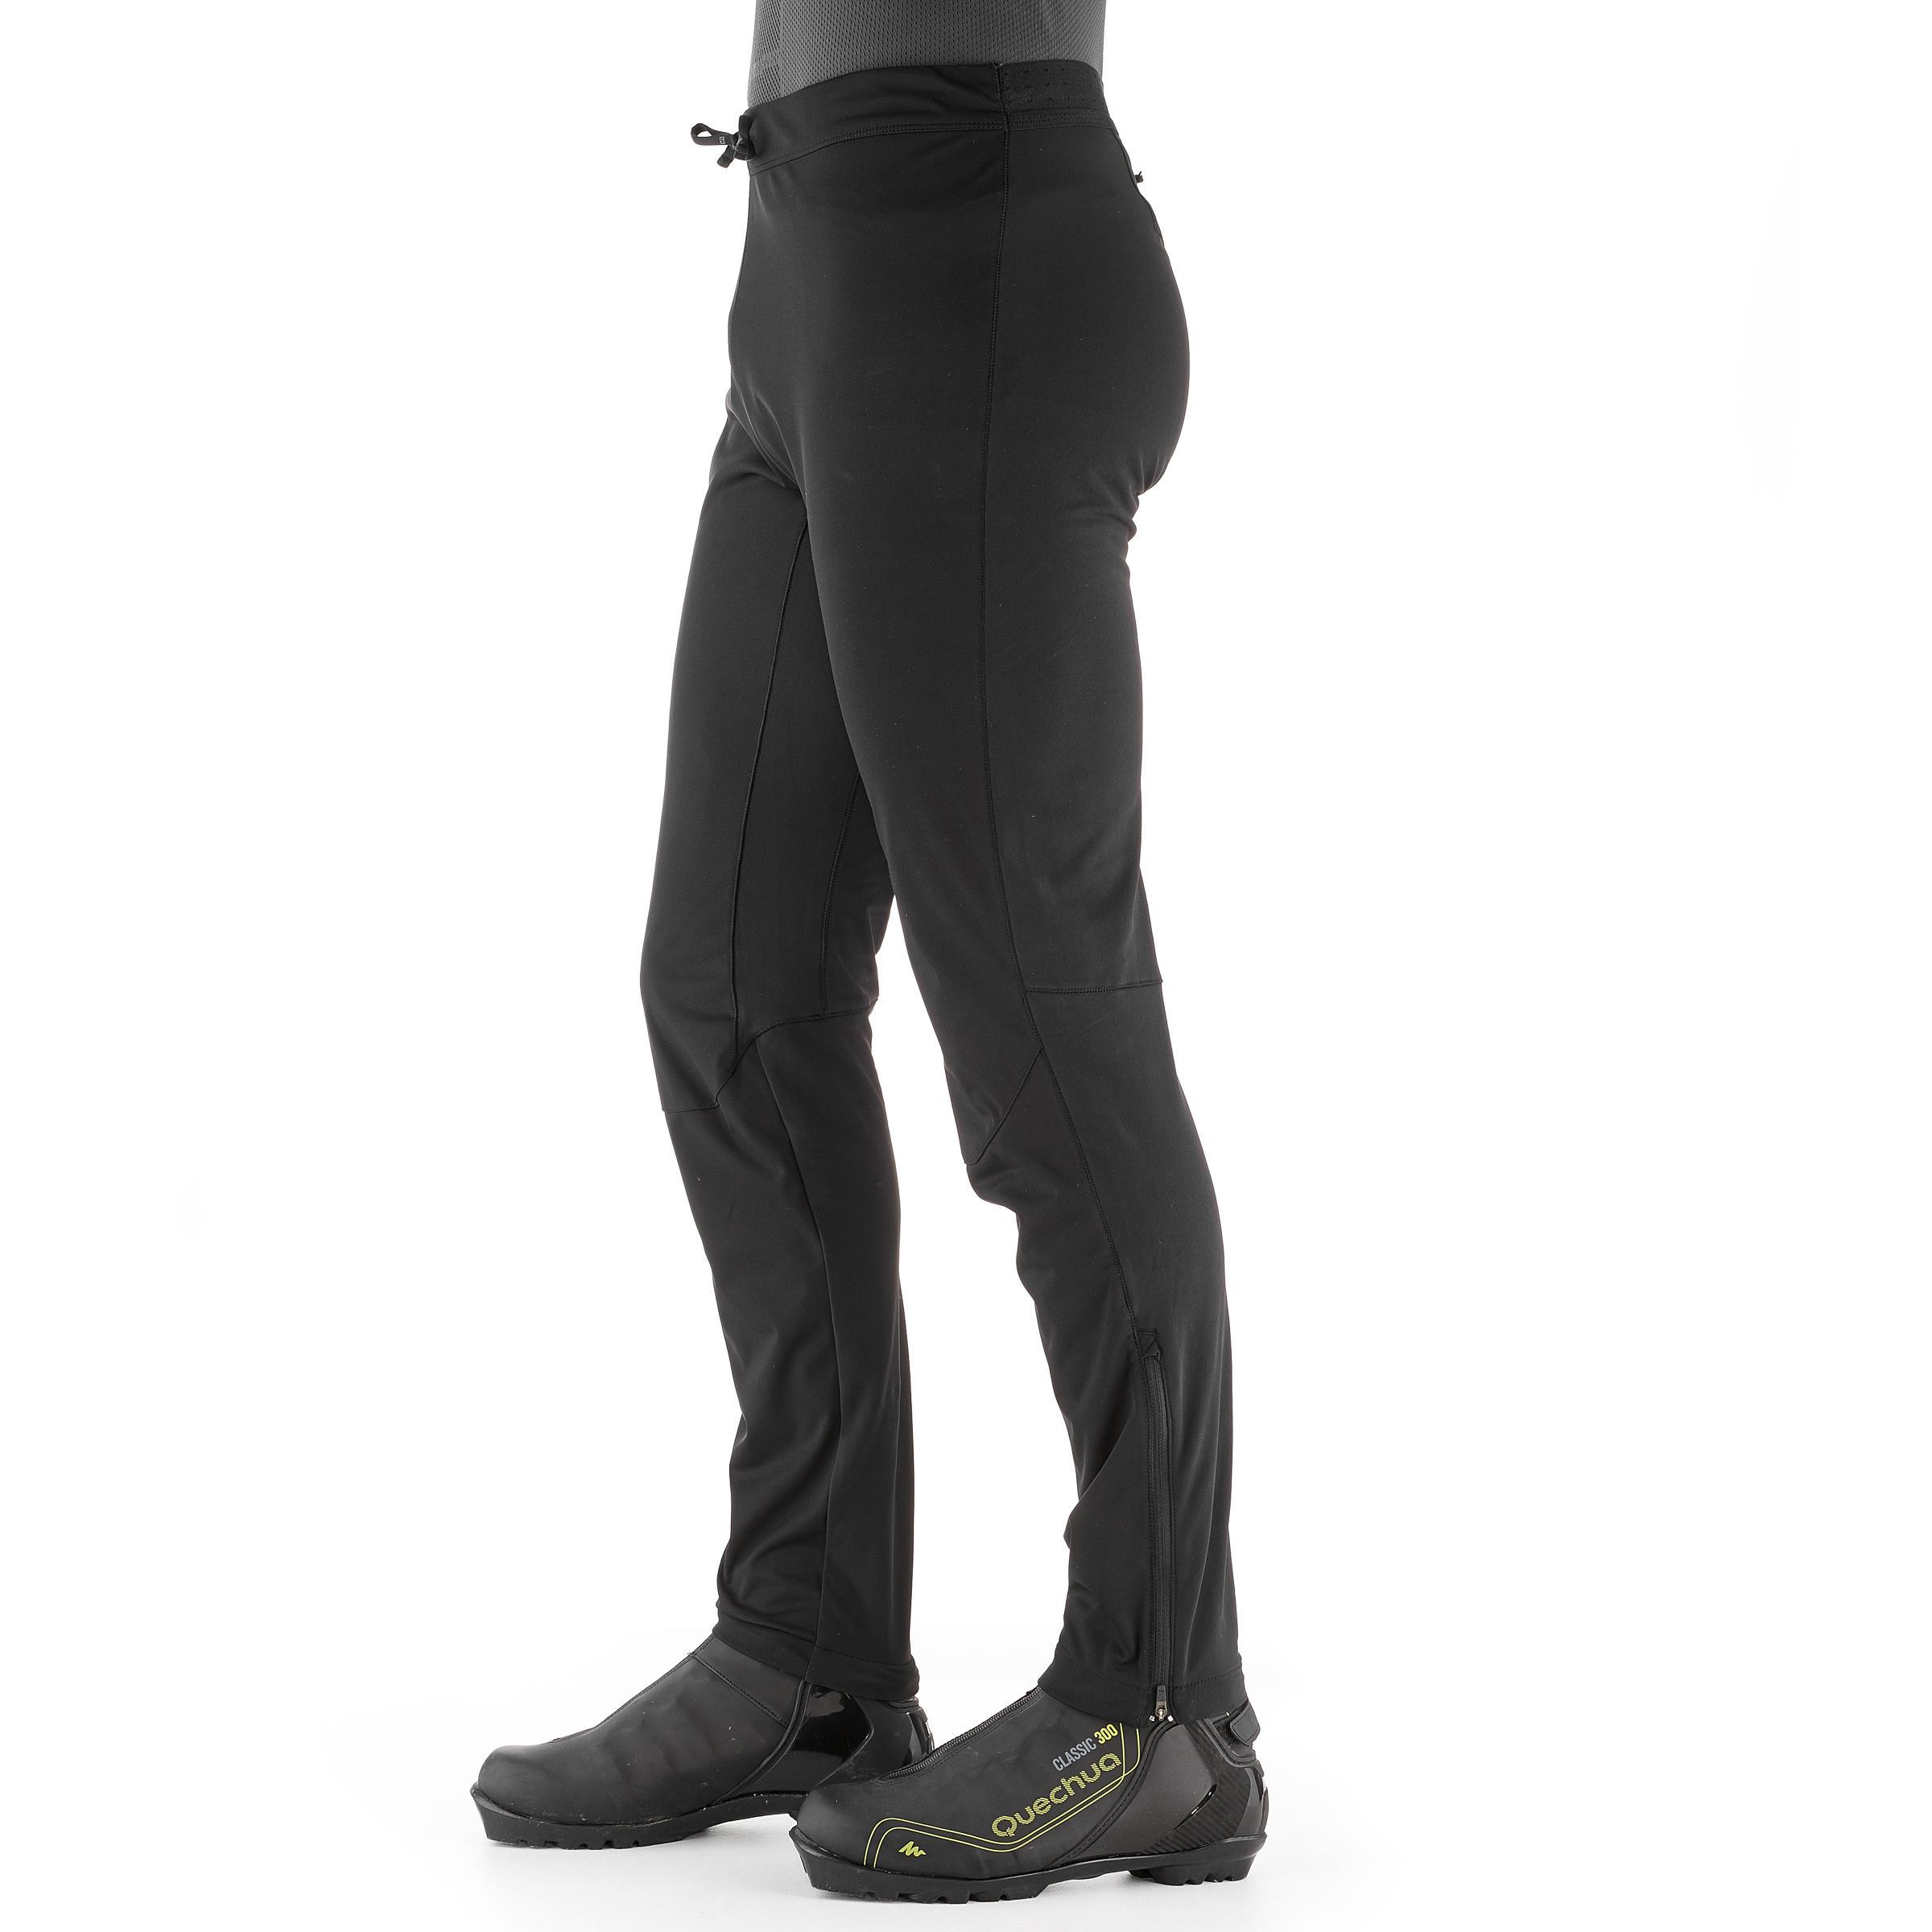 Pantalon Homme Rs Ski Fond Softshell Noir De LqUVGSzMp